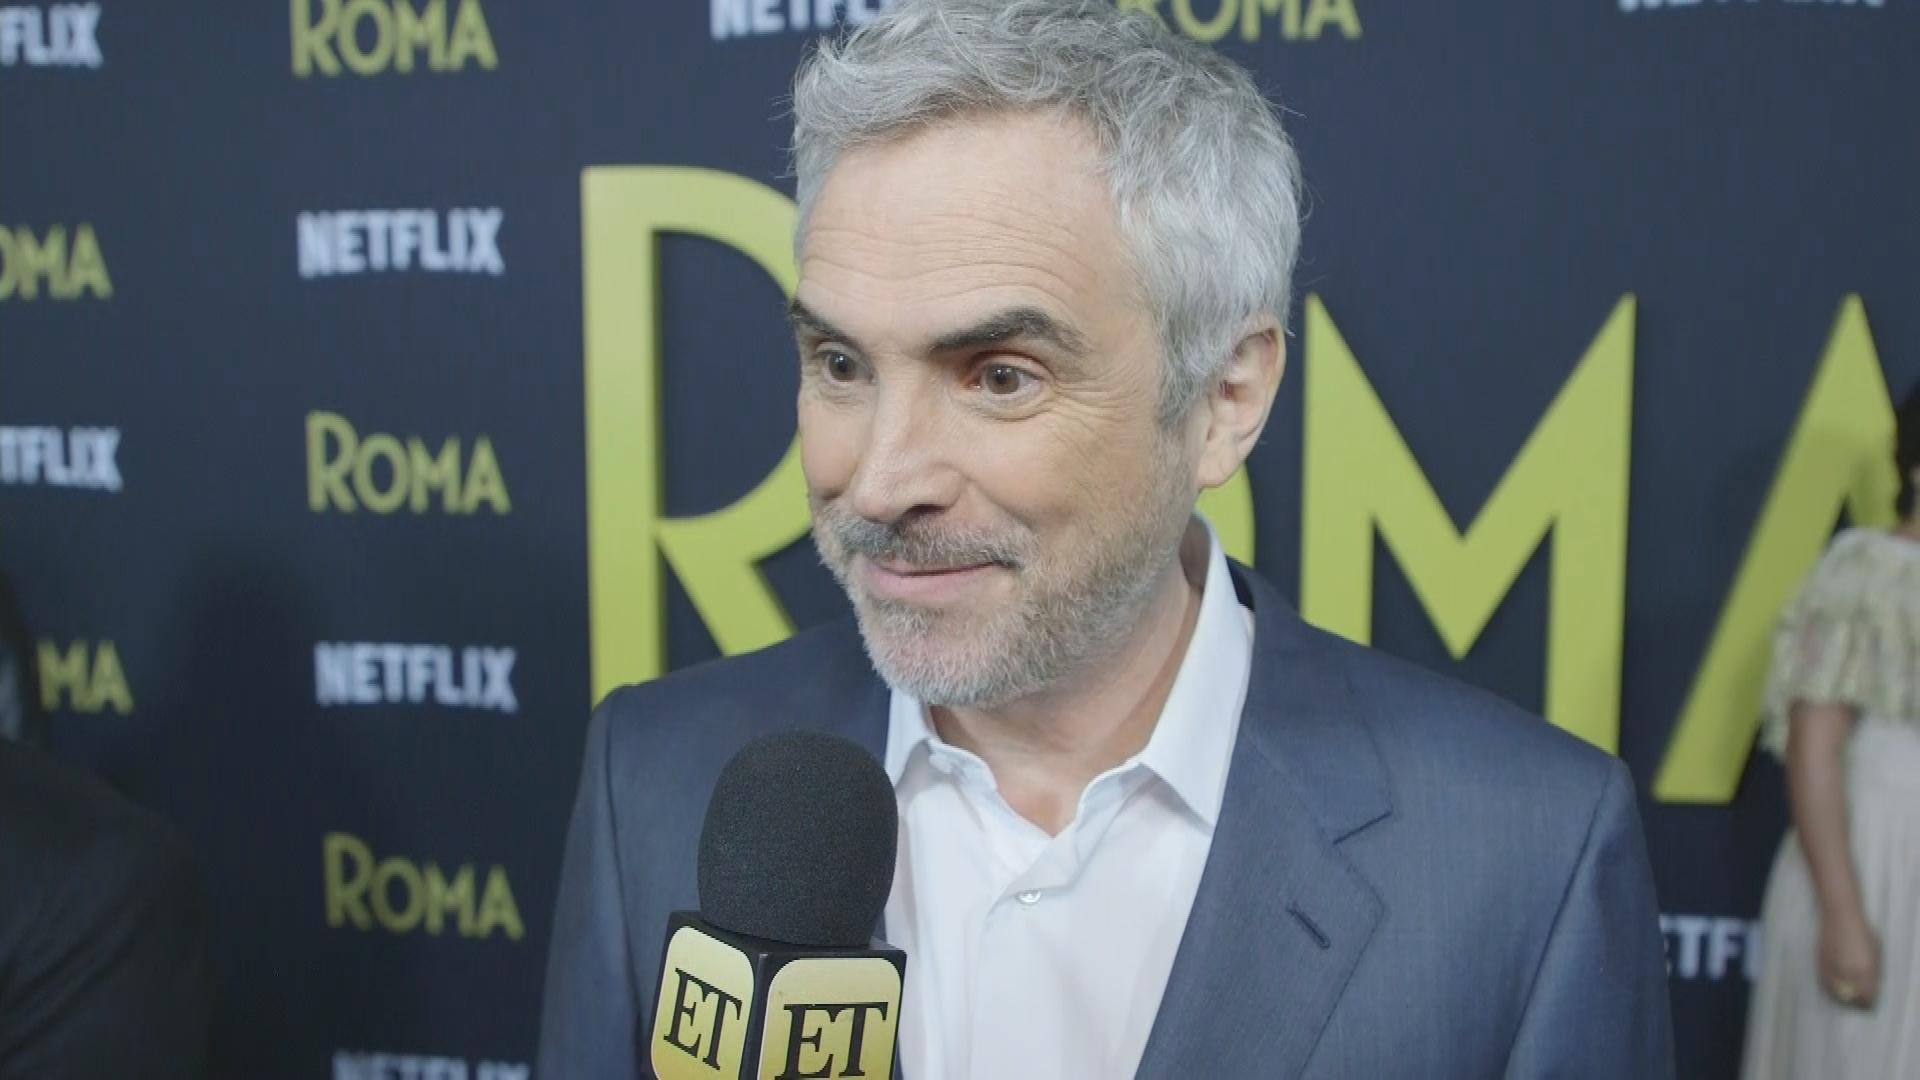 DGA Awards 2019: Alfonso Cuaron, Complete Winners List